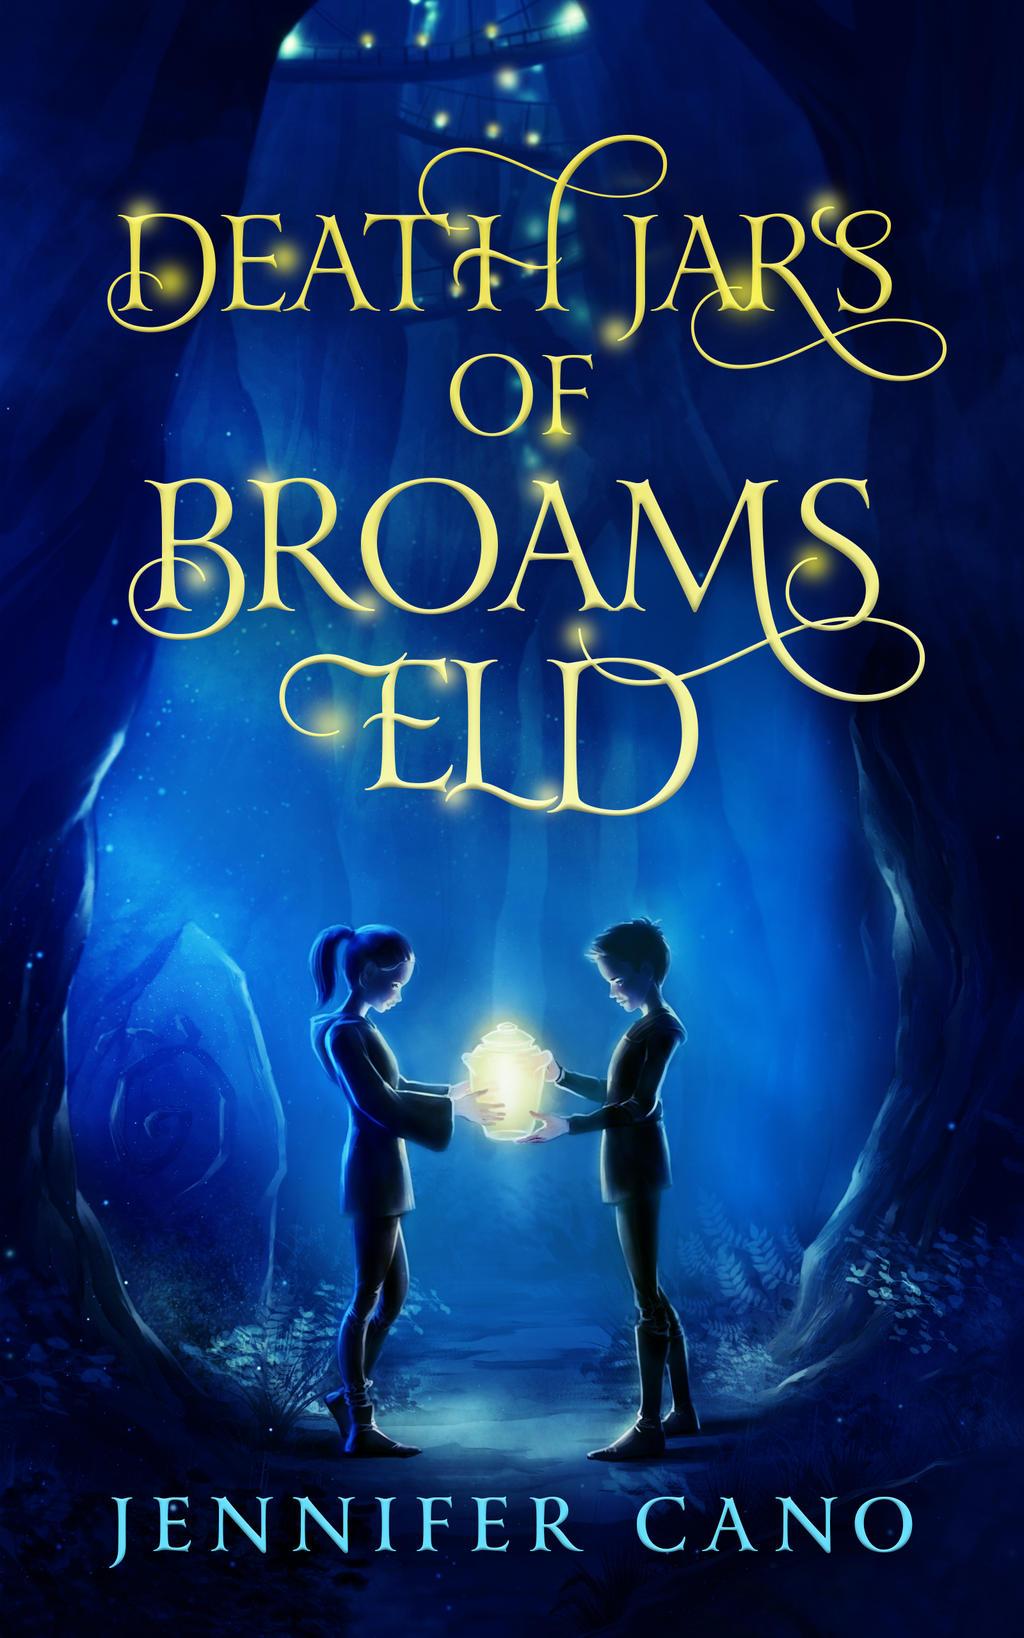 Book Cover Design Deviantart : Book cover design for death jars of broams eld by